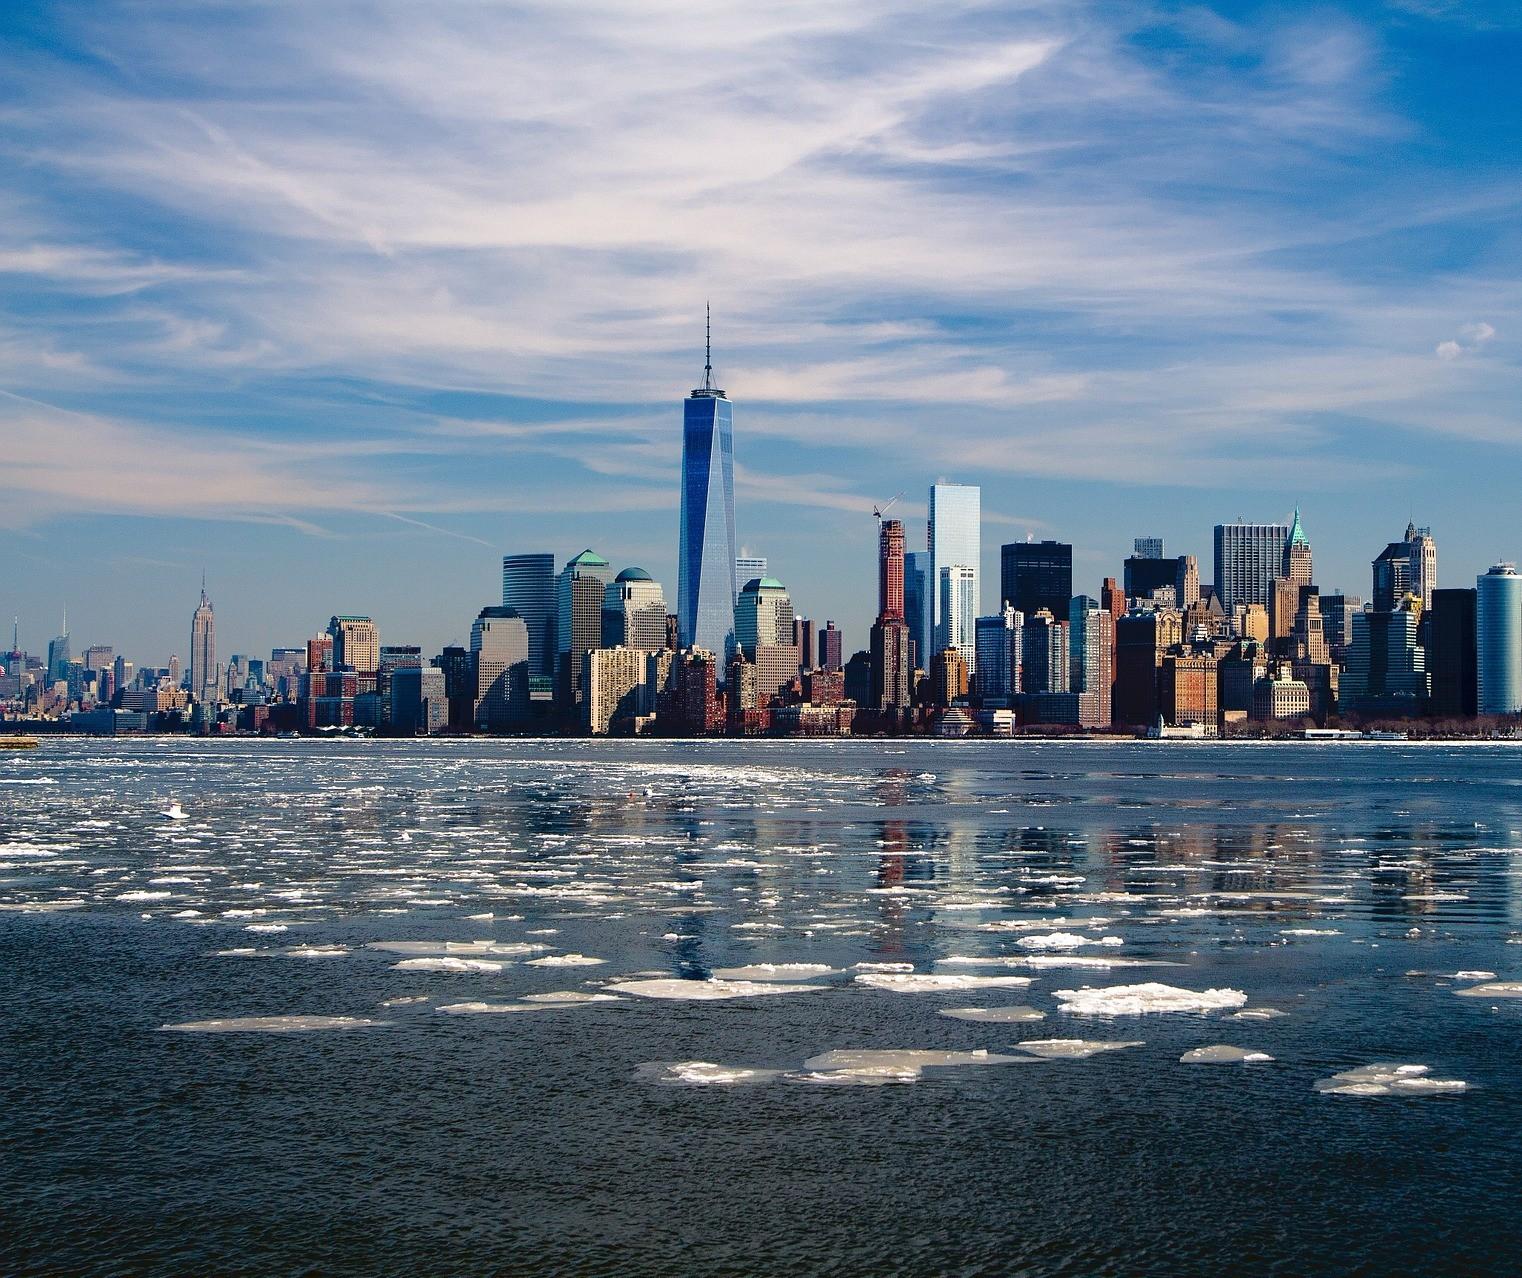 O Dia Mundial das Cidades